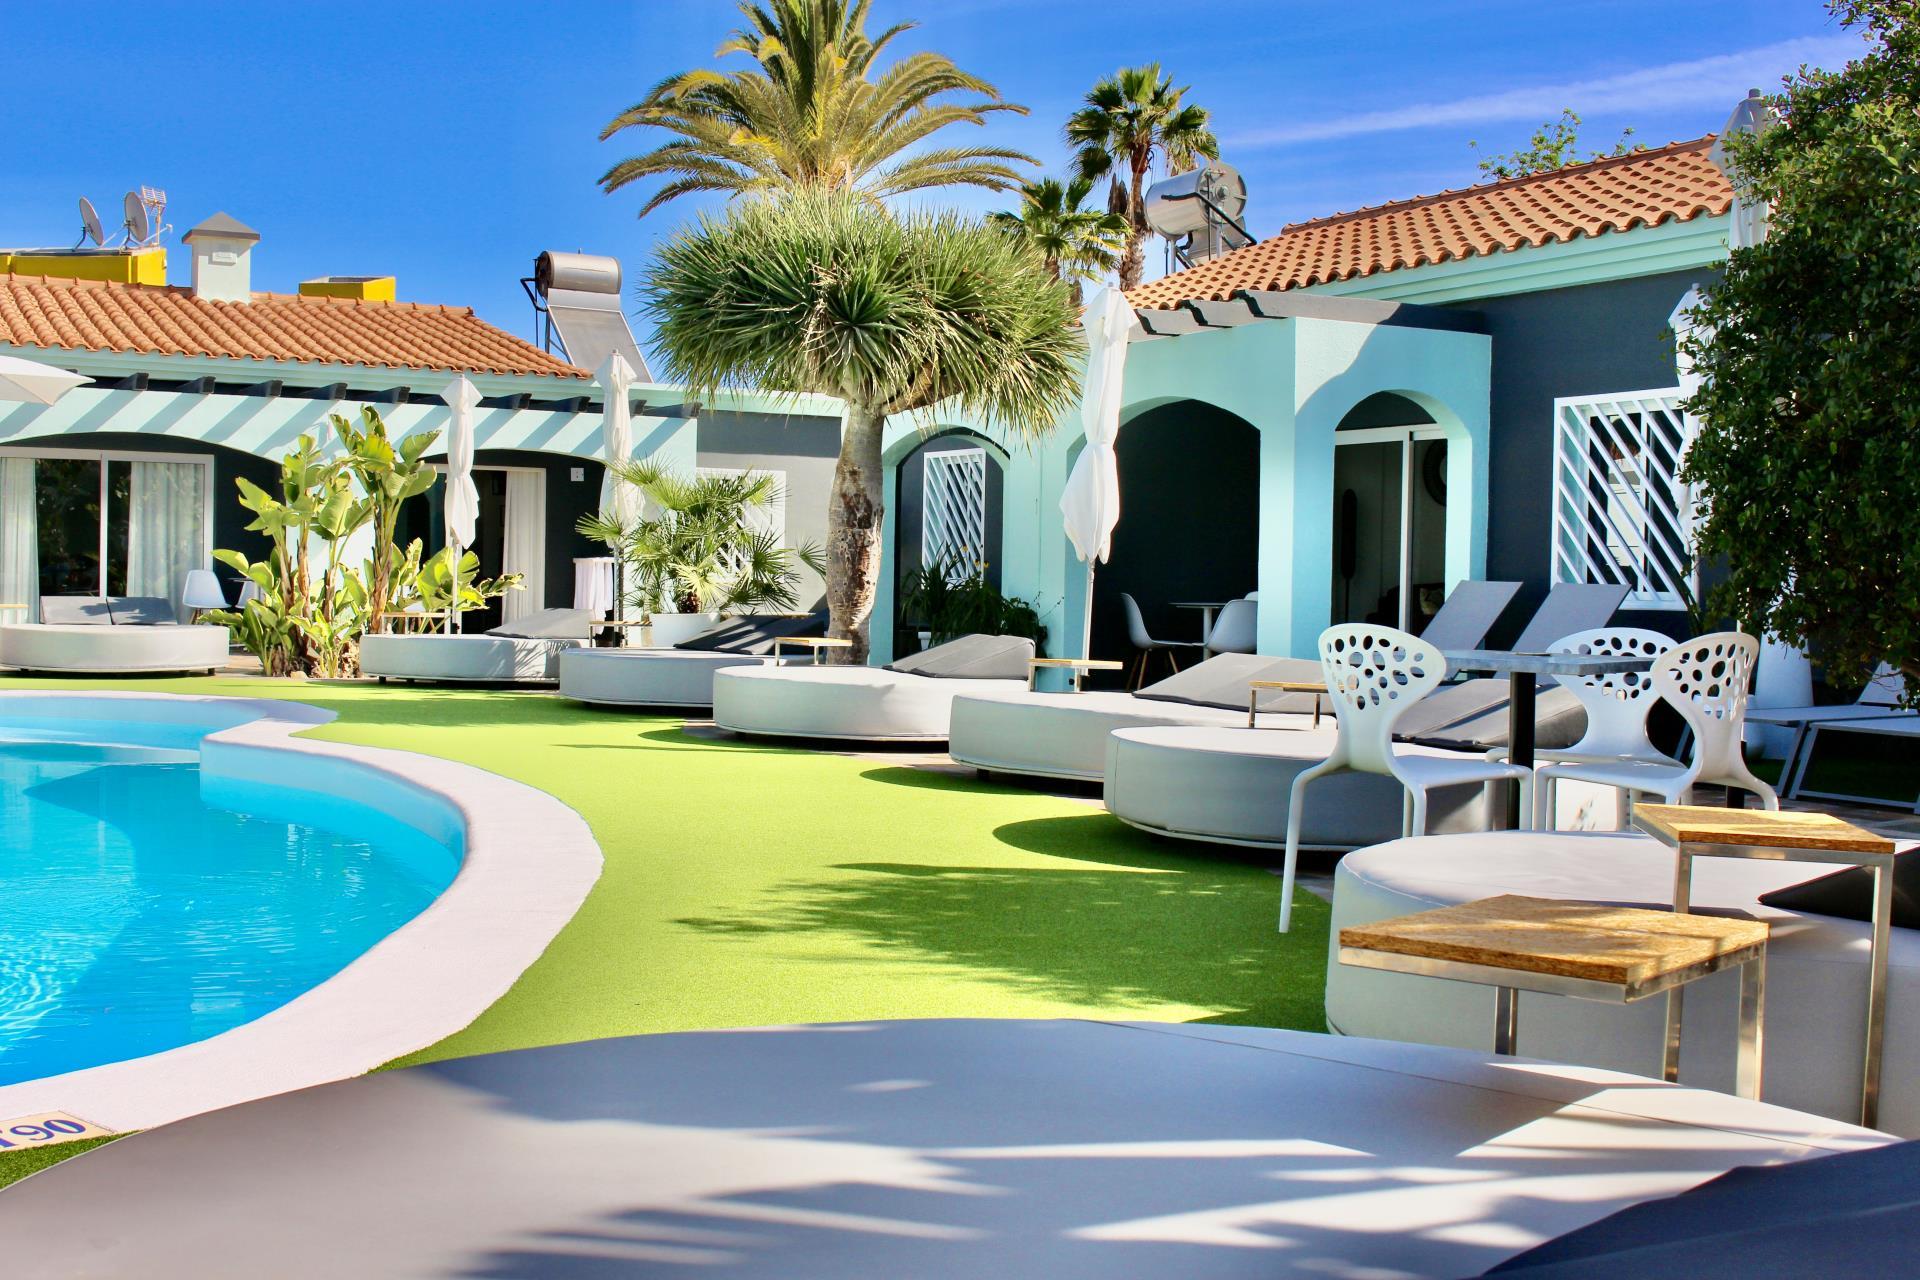 De Ligweide van Naturisten hotel Artika Natura Maspalomas in Gran Canaria